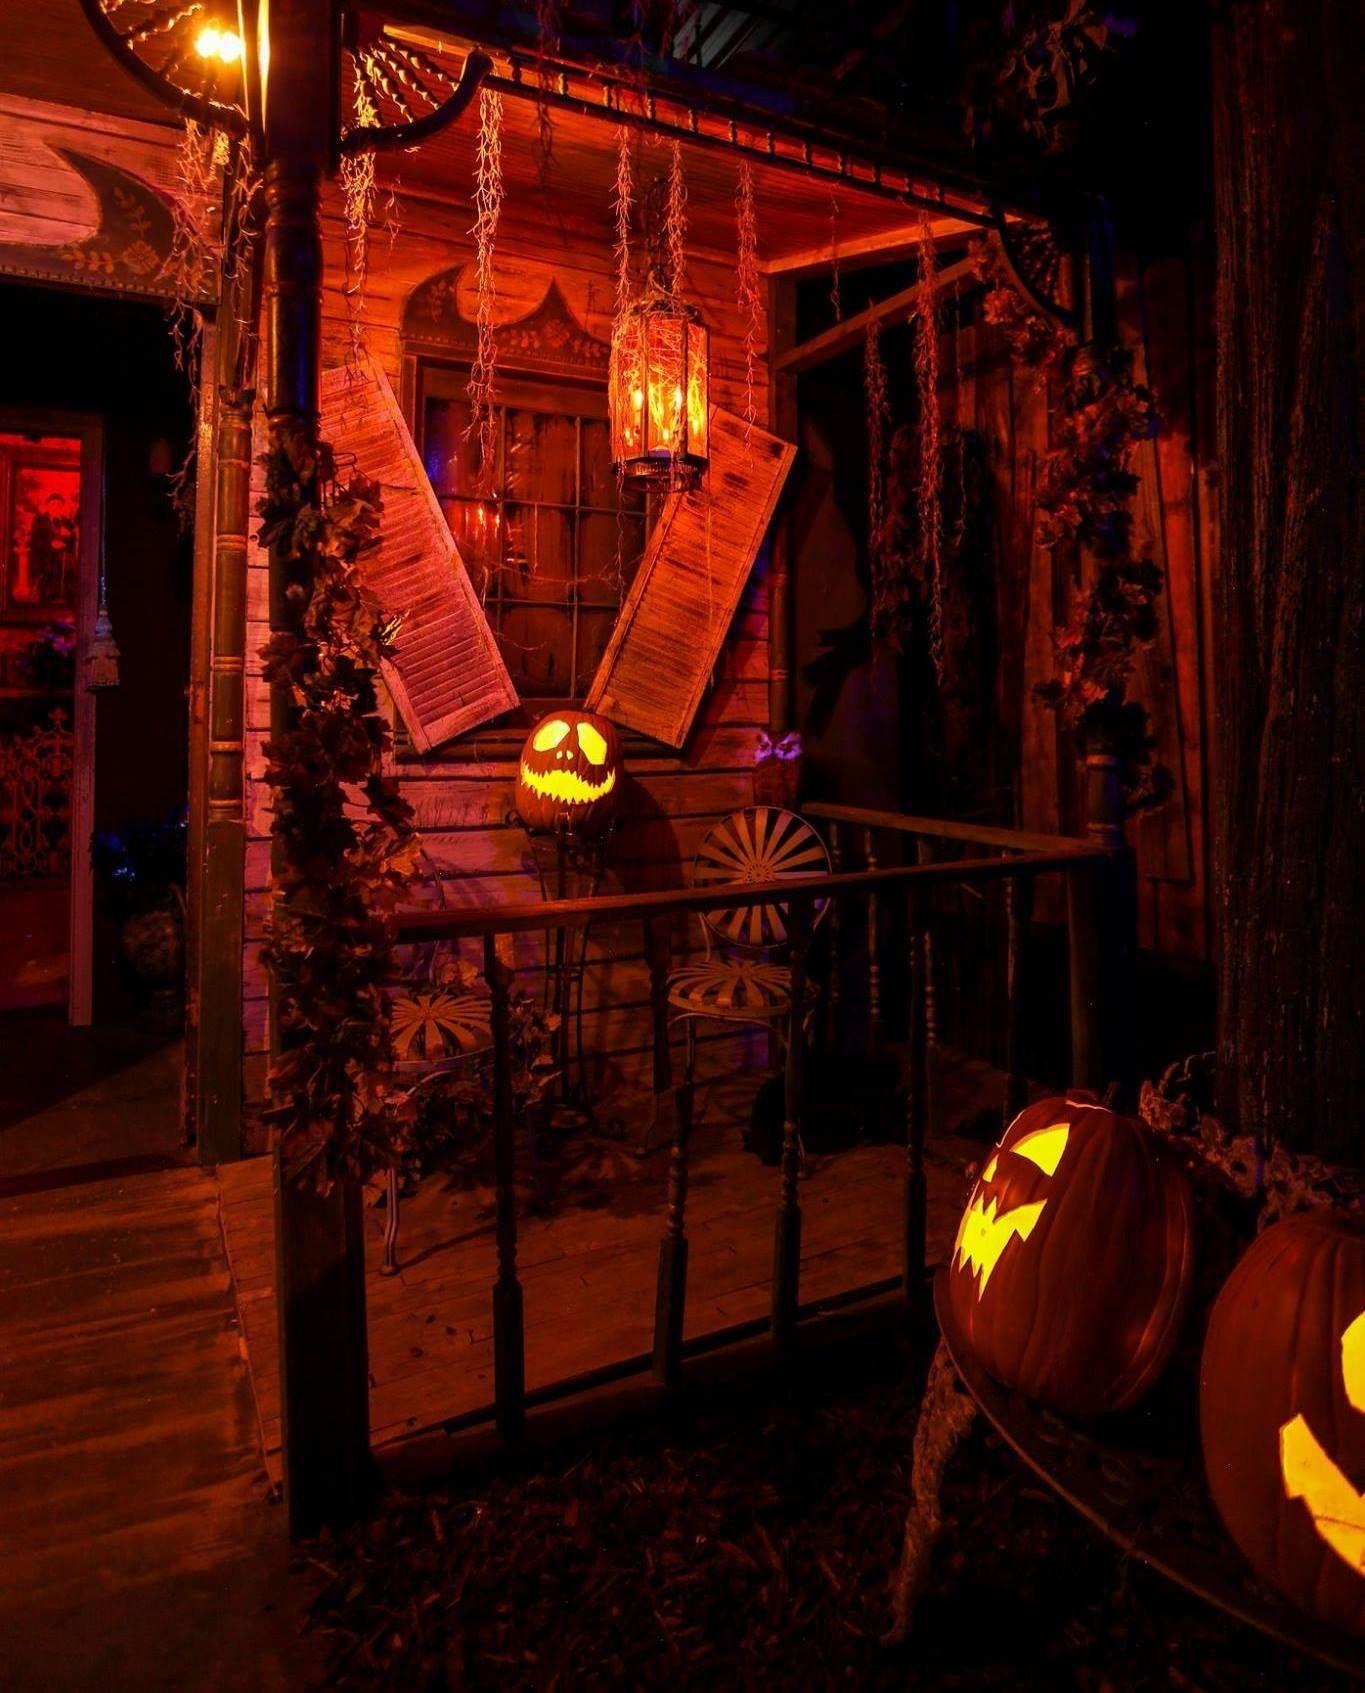 Pin By Jess P On Inspo: Halloweenspirations